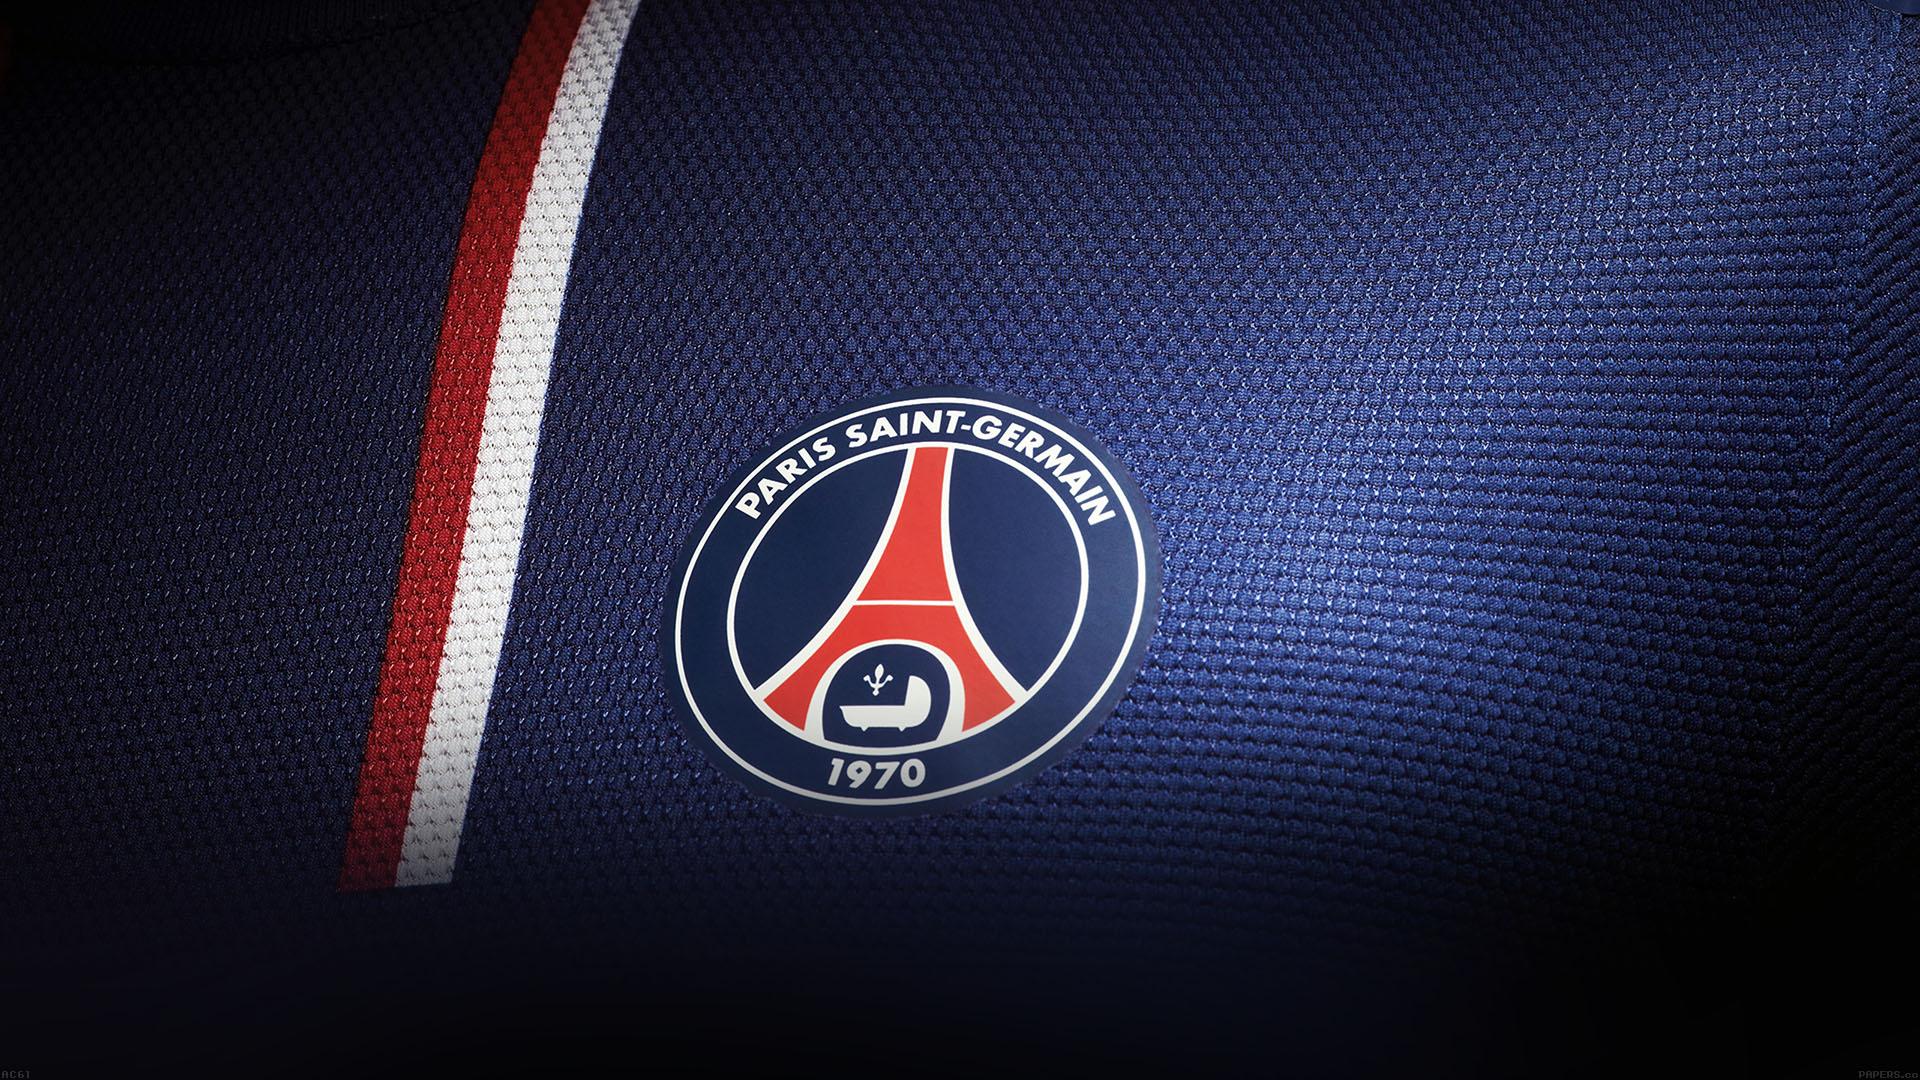 Cute Animal Soccer Wallpaper Pictures Ac61 Wallpaper Psg Paris Saint Germain Fc Jersey Logo